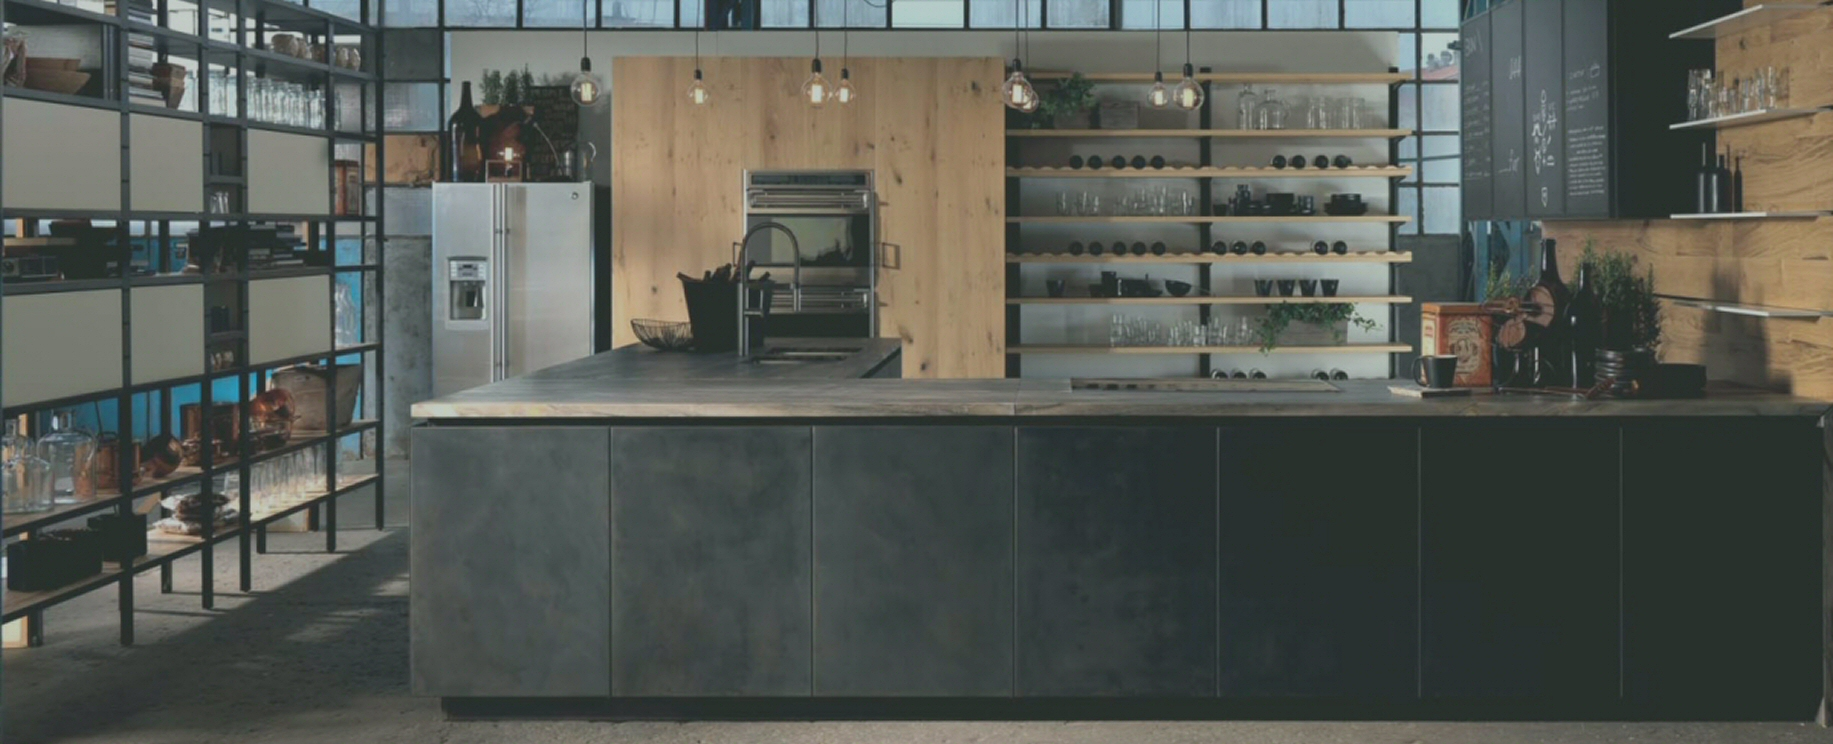 Arredamento su misura - Interior studio Boveri